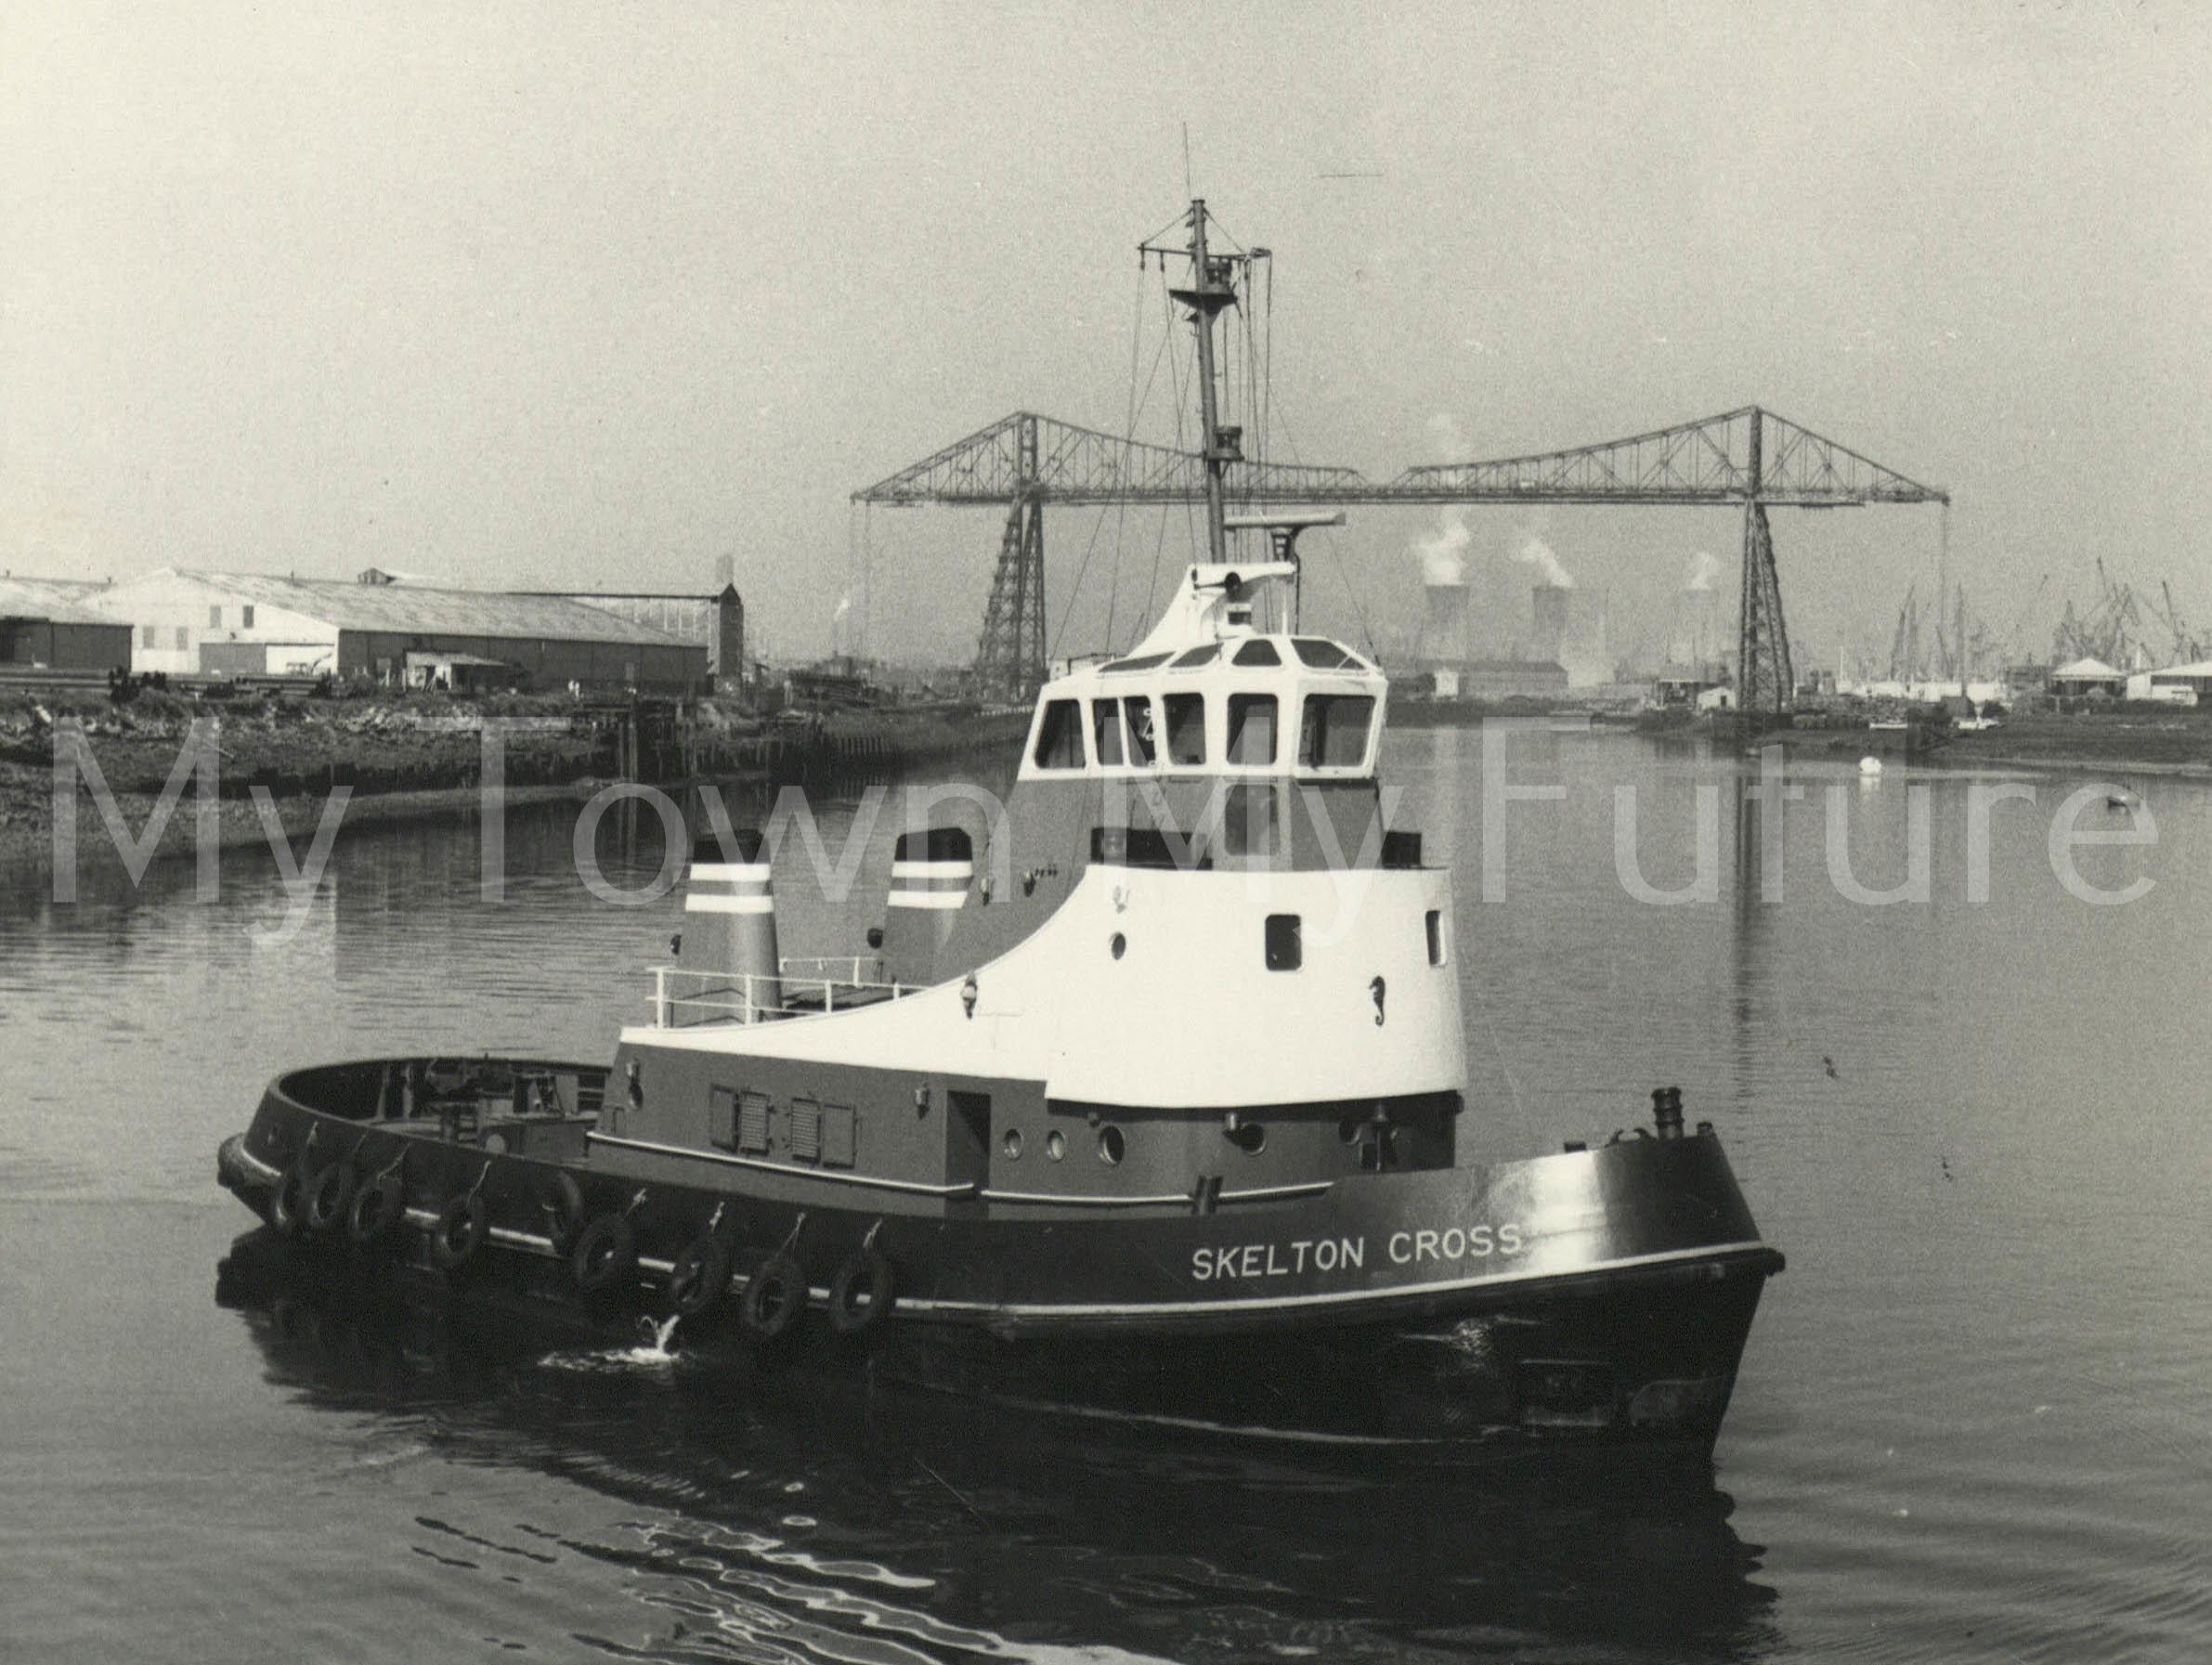 Tug Boat - Skelton Cross